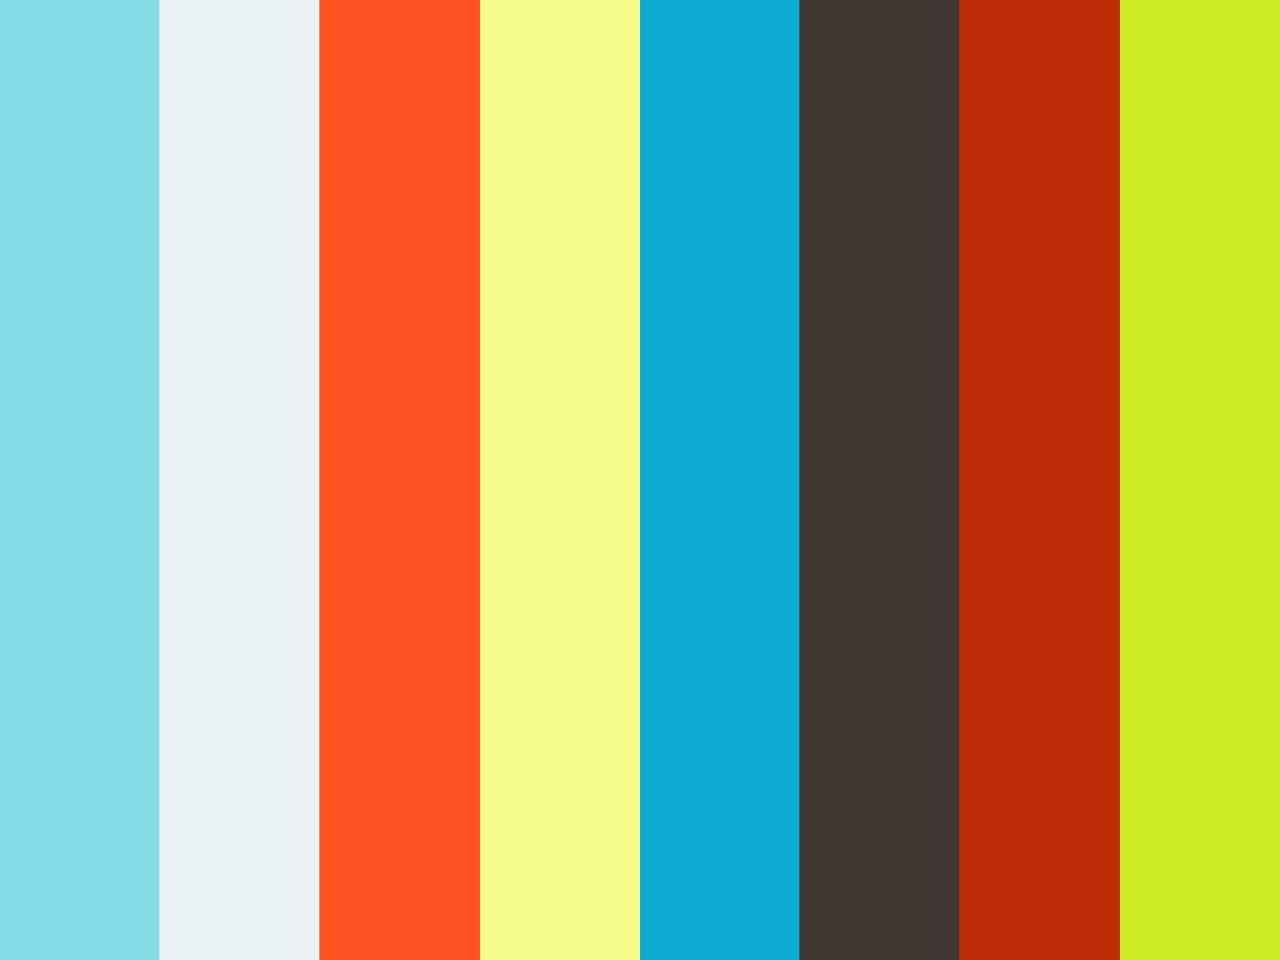 Webstock '10: Daniel Burka - Iterative Design Strategies